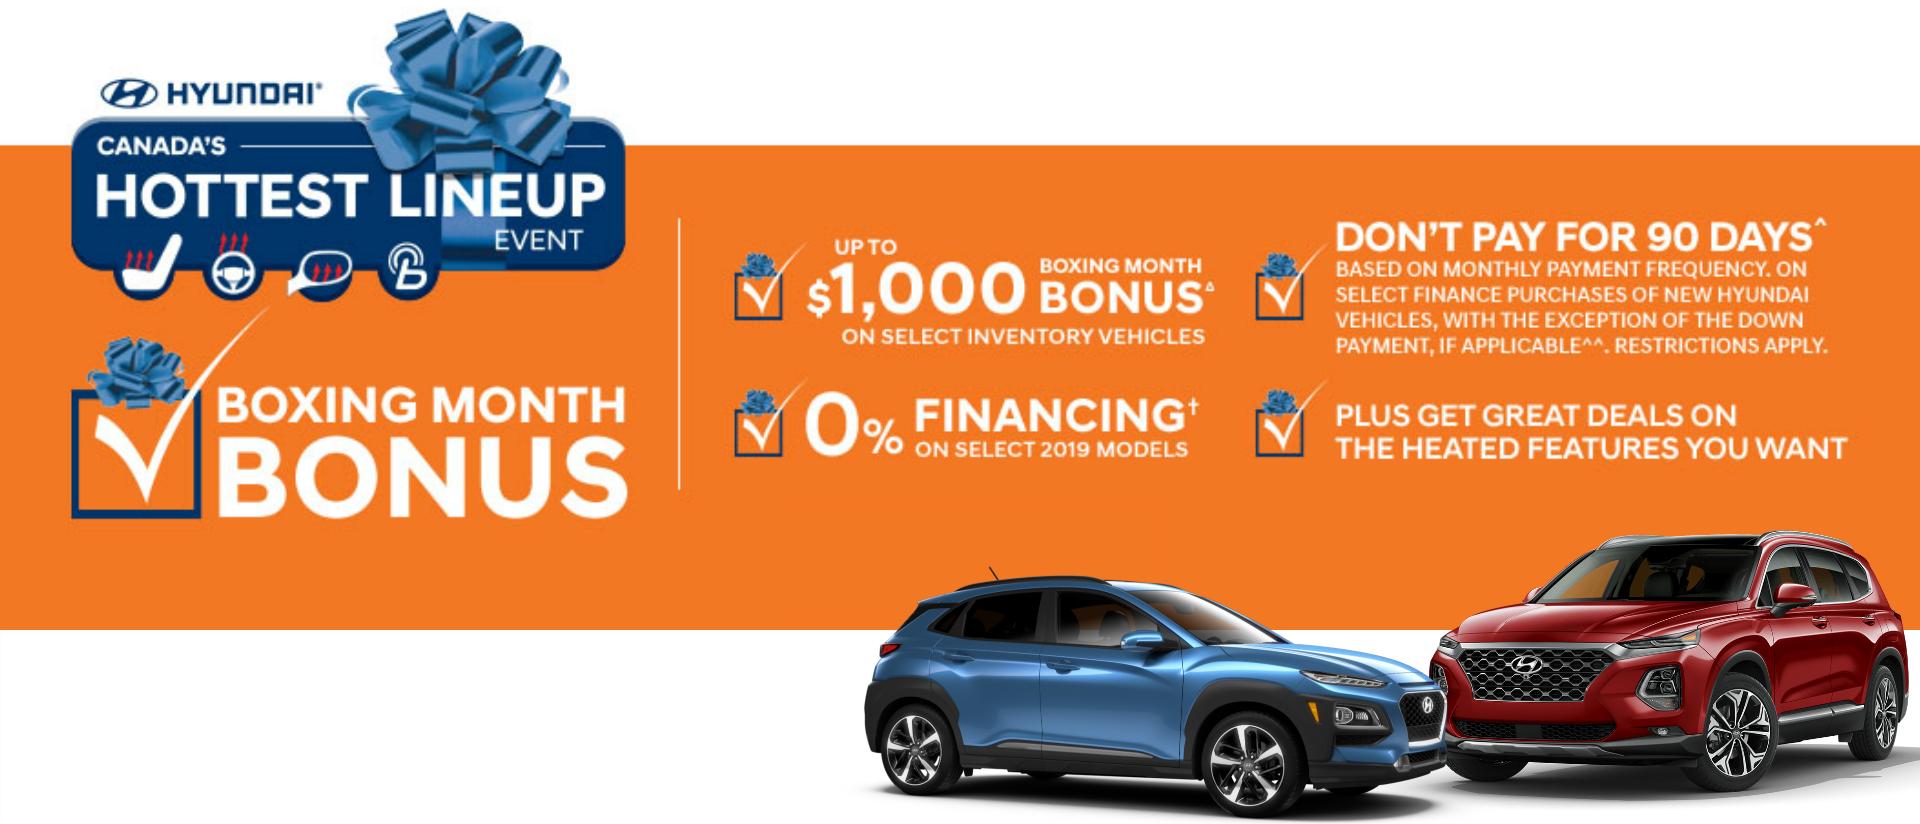 Hyundai Boxing Month Bonus